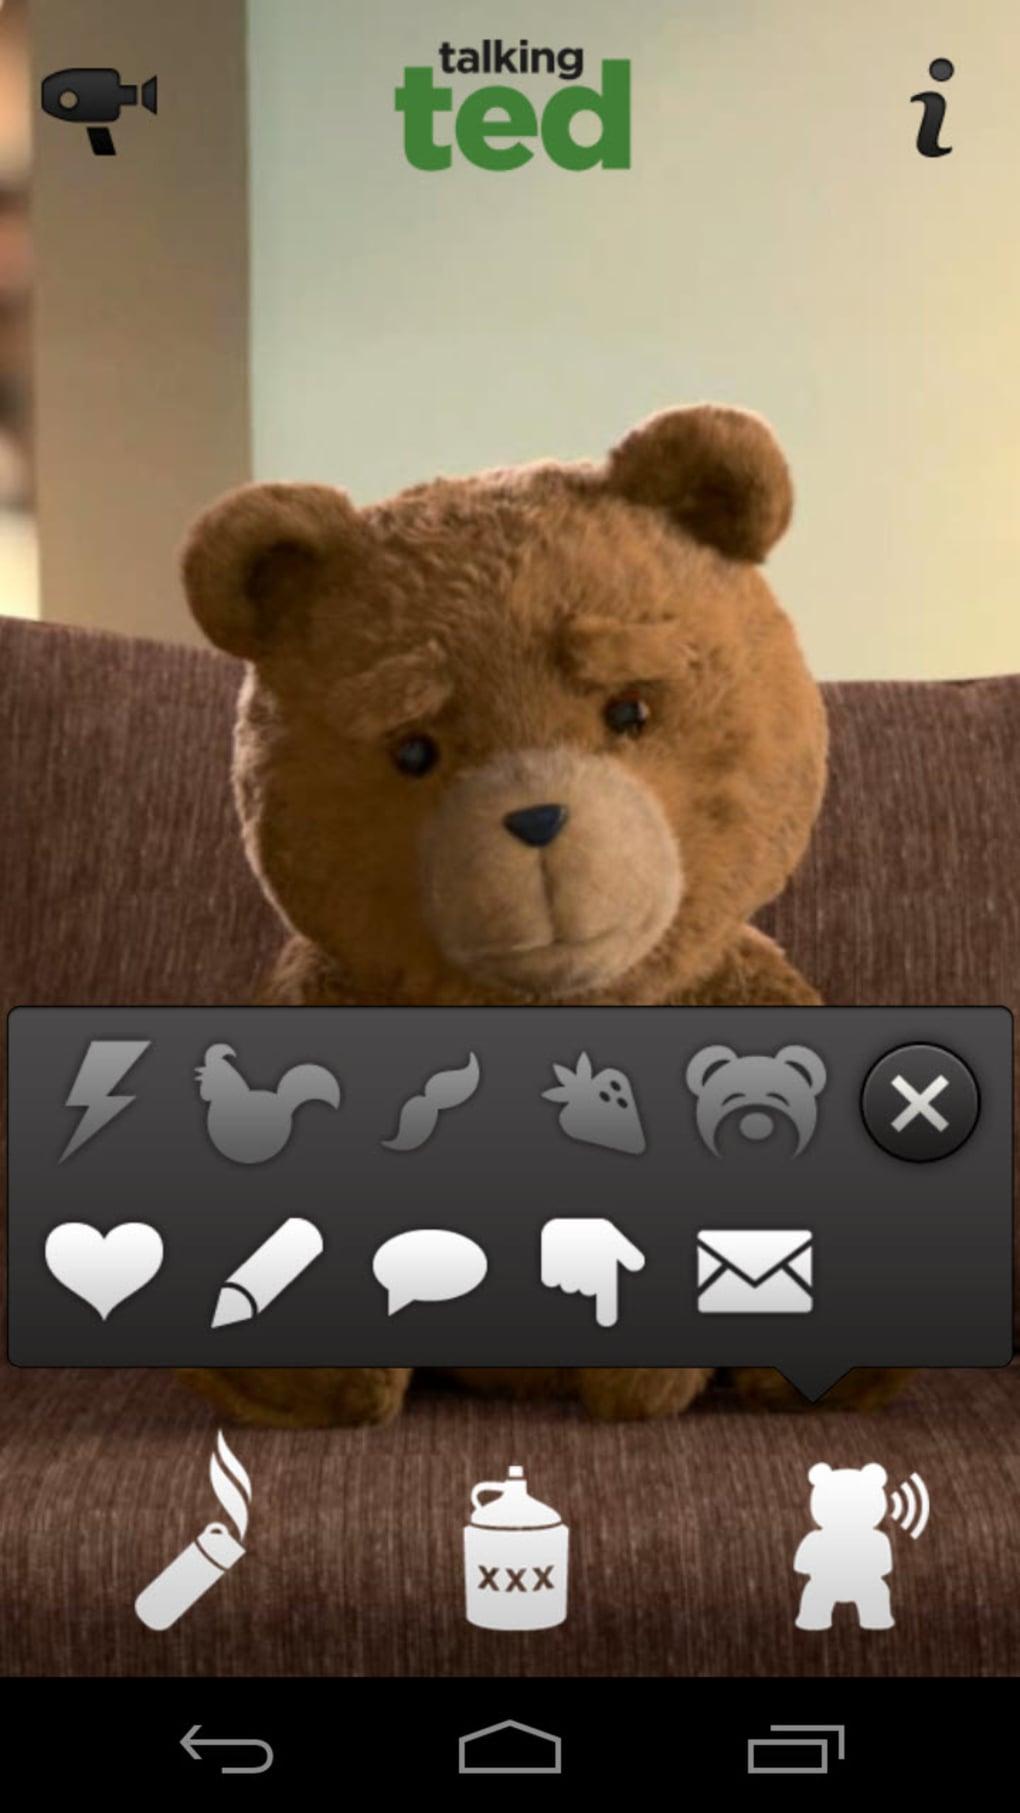 Ted Kostenlos Downloaden